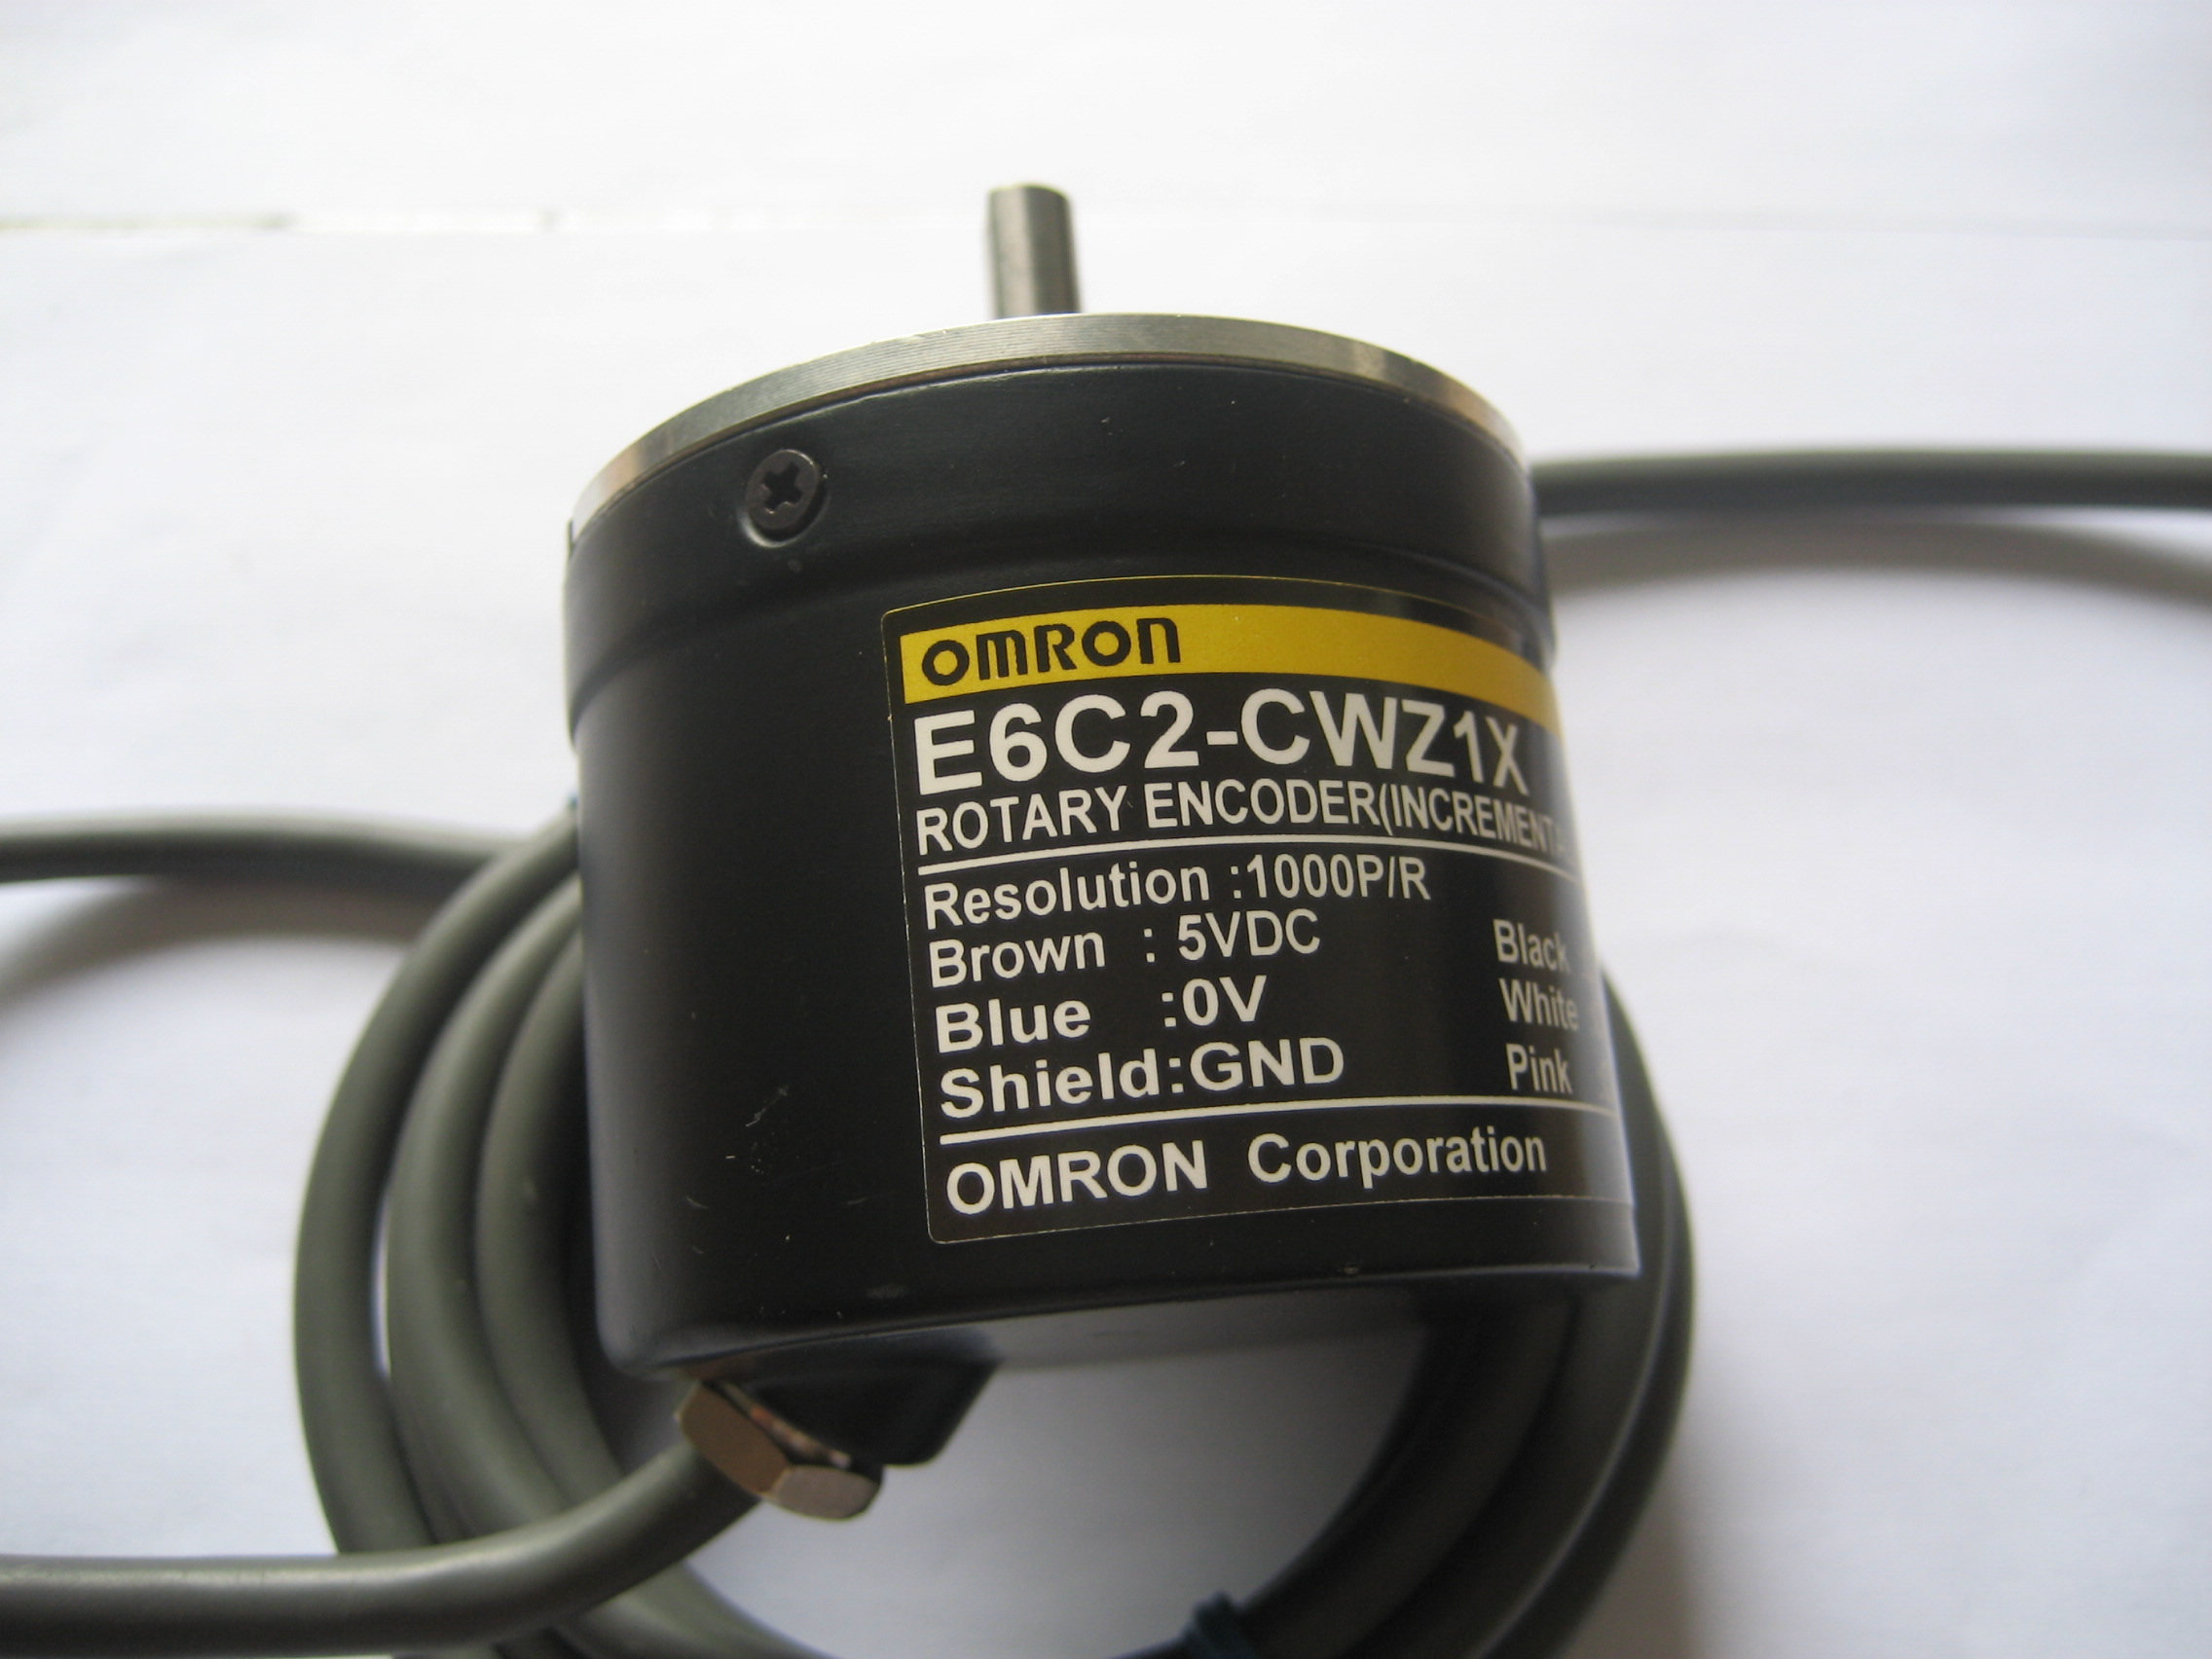 FREE SHIPPING Servo Motor Encoder E6c2-cwz1x 1500P/R